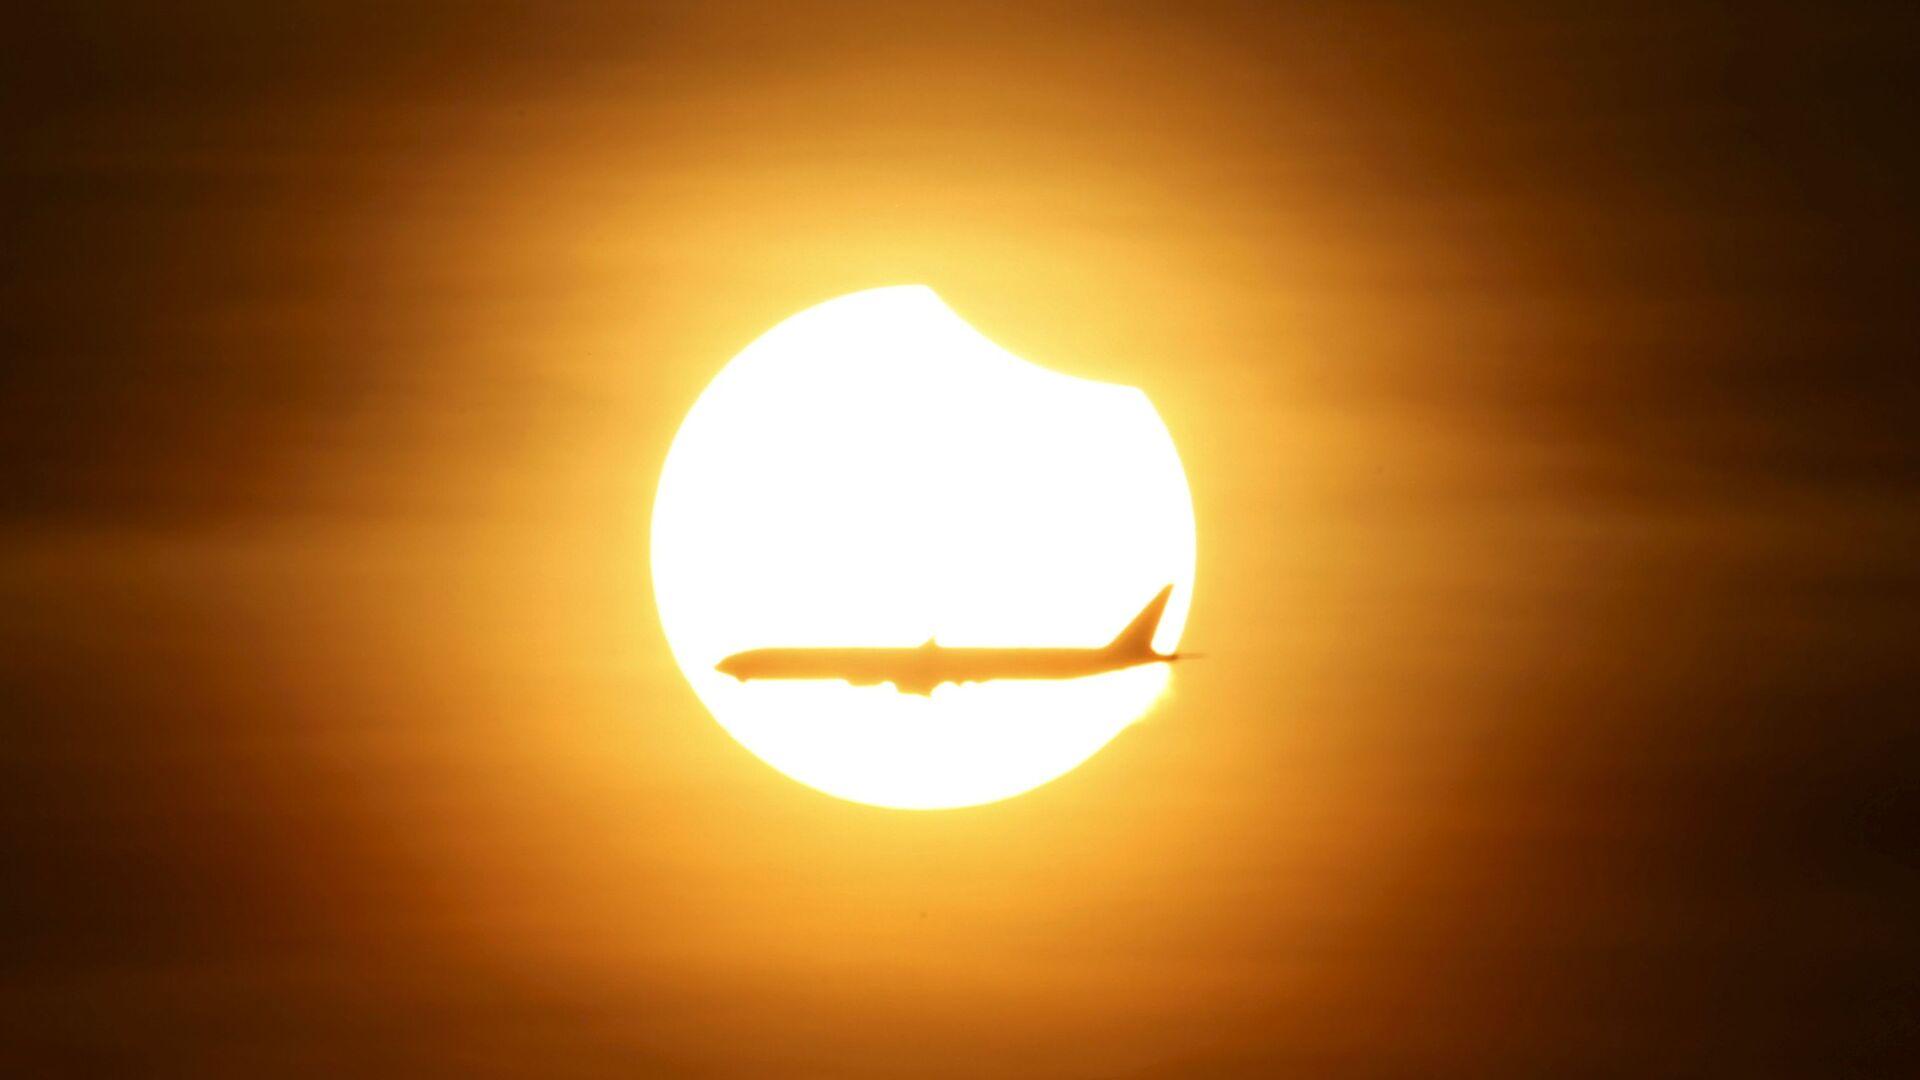 Eclissi solare - Sputnik Italia, 1920, 08.06.2021